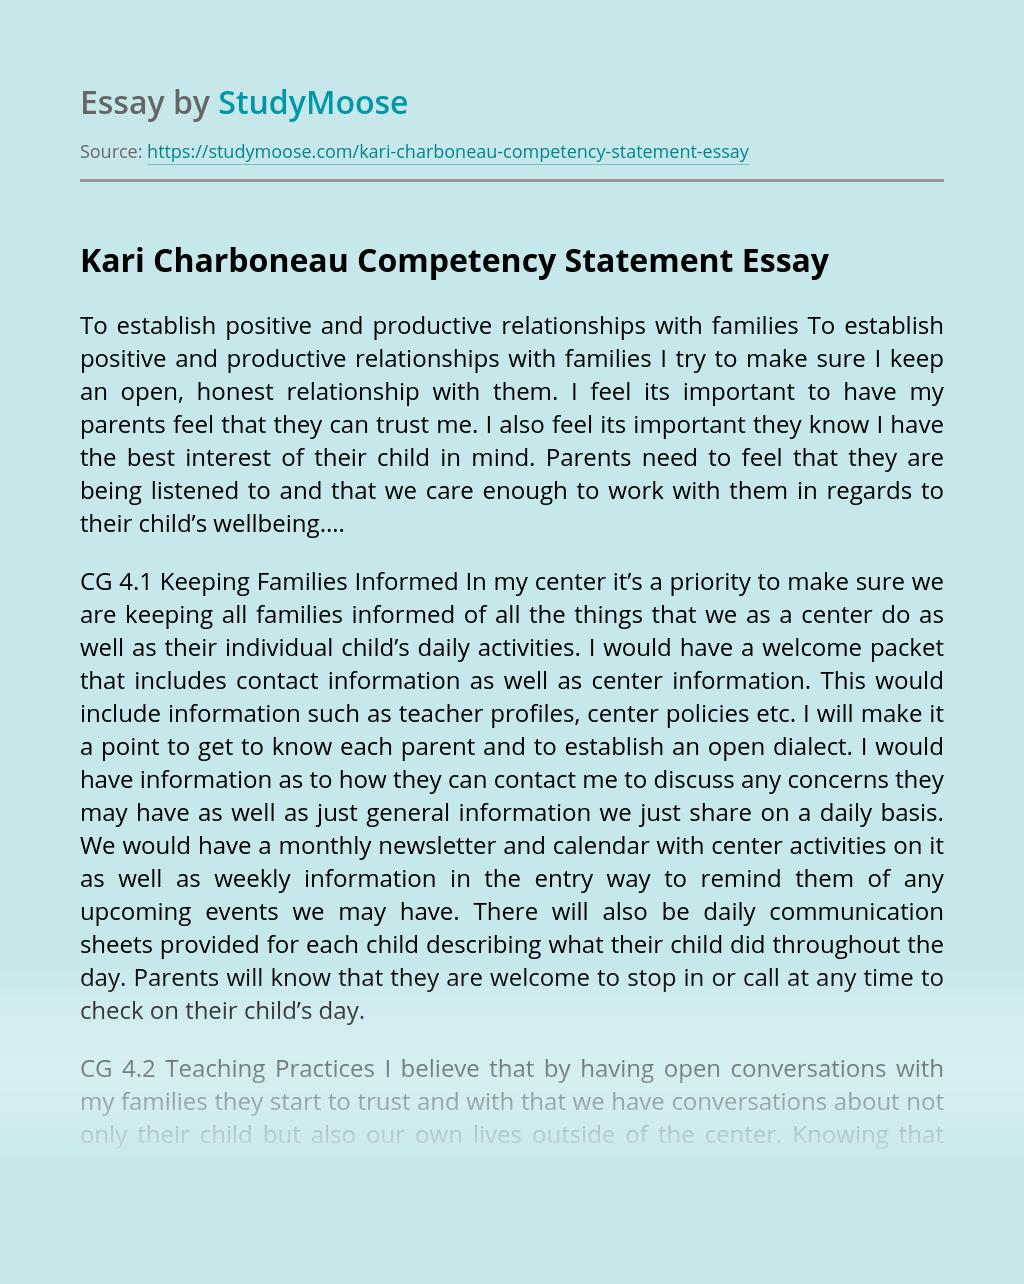 Kari Charboneau Competency Statement